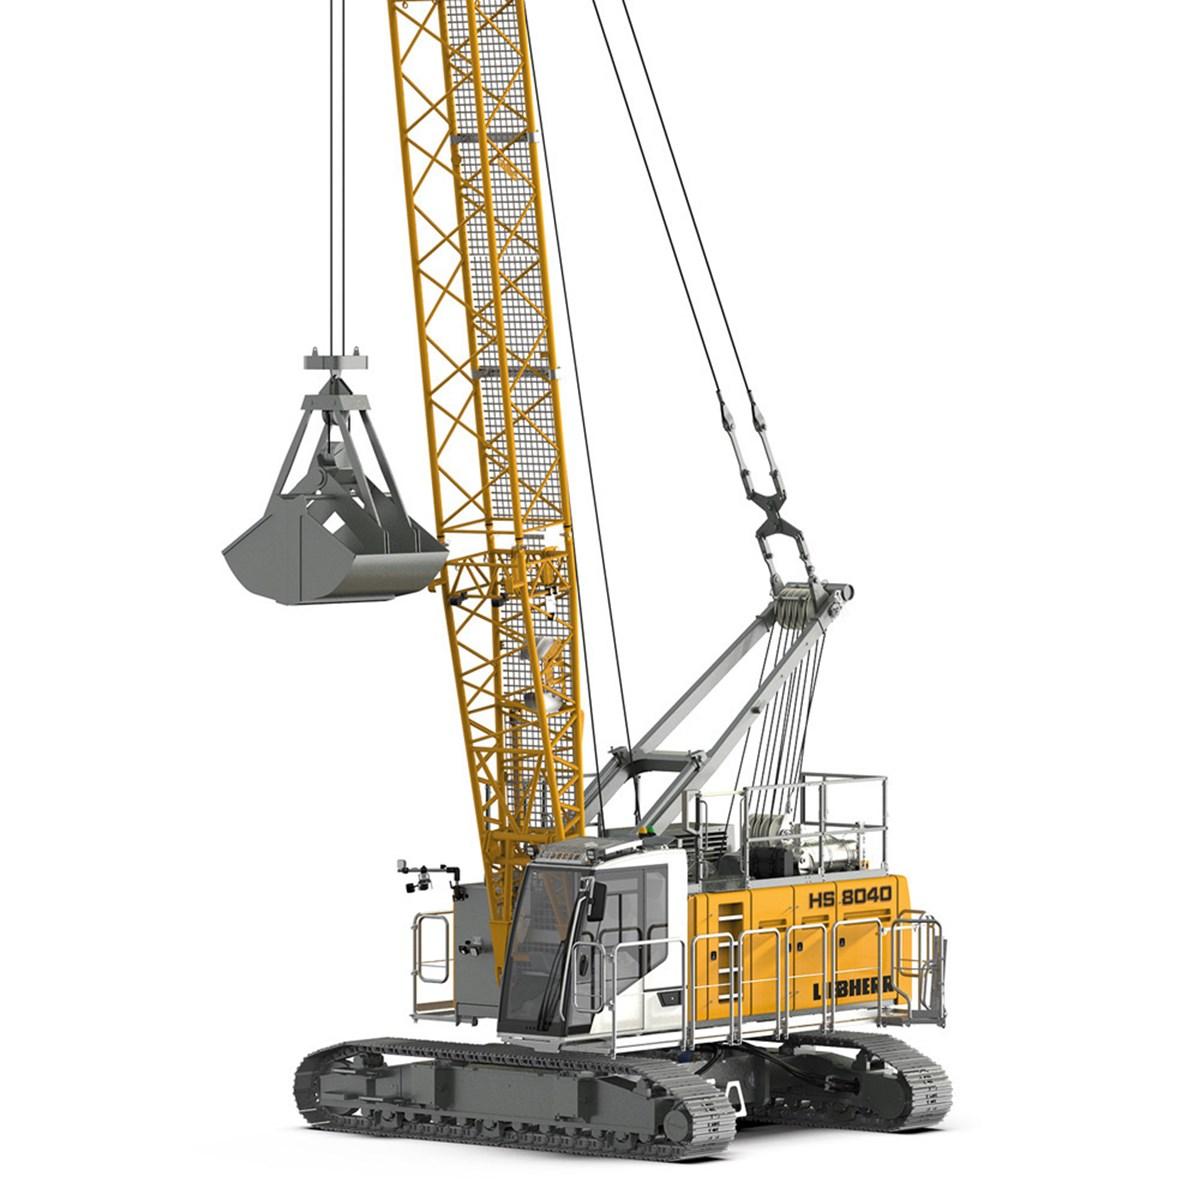 liebherr-hs-8040-1-duty-cycle-crawler-crane-seilbagger-grab.jpg